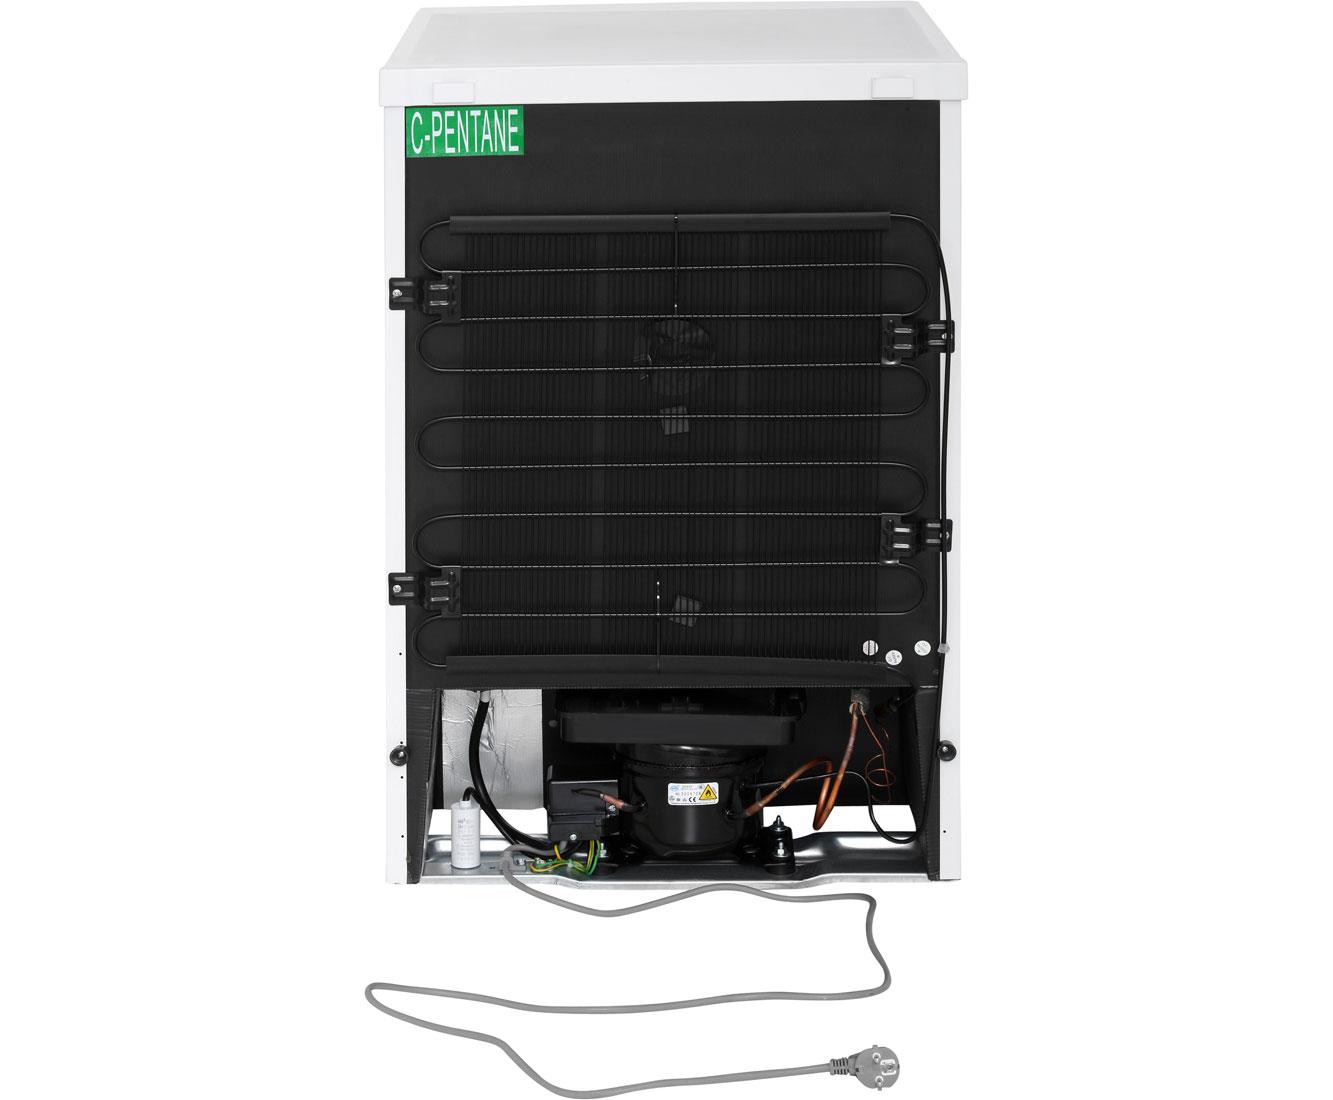 Mini Kühlschrank Energiesparend : Single kühlschrank mit gefrierfach finebuy mini kühlschrank